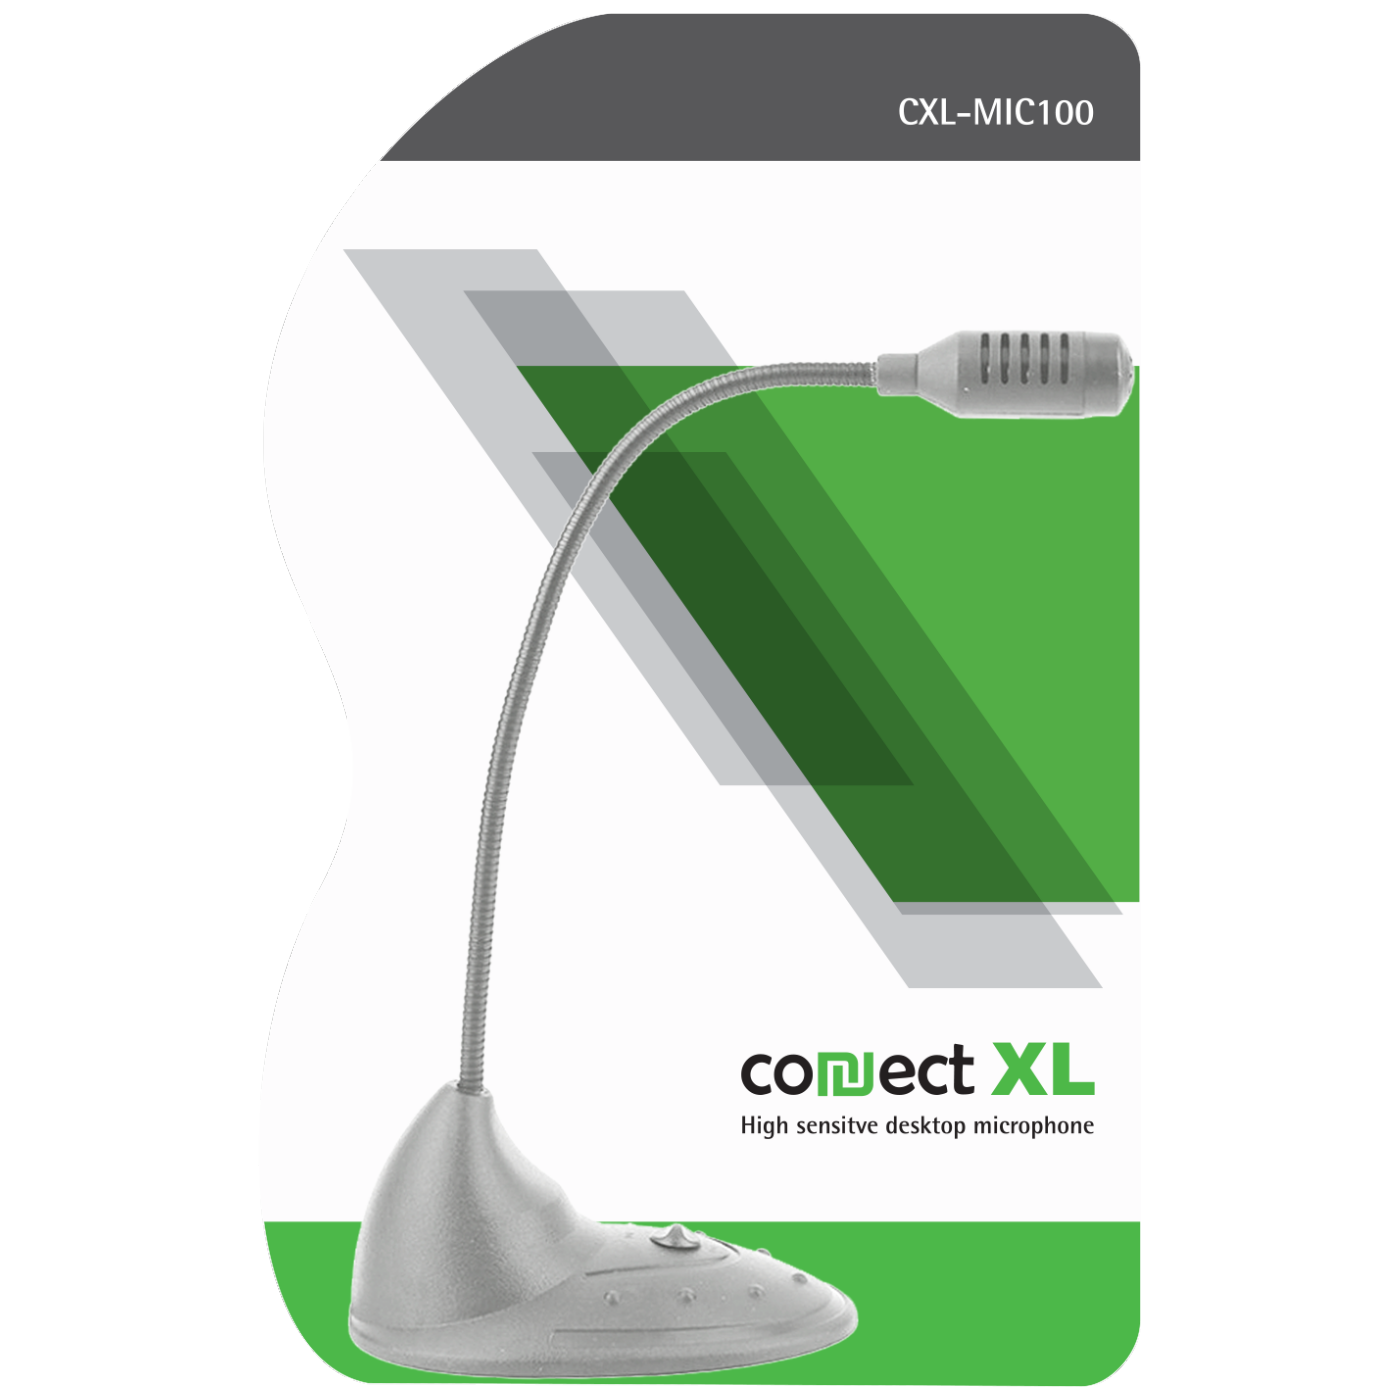 Connect XL - CXL-MIC100